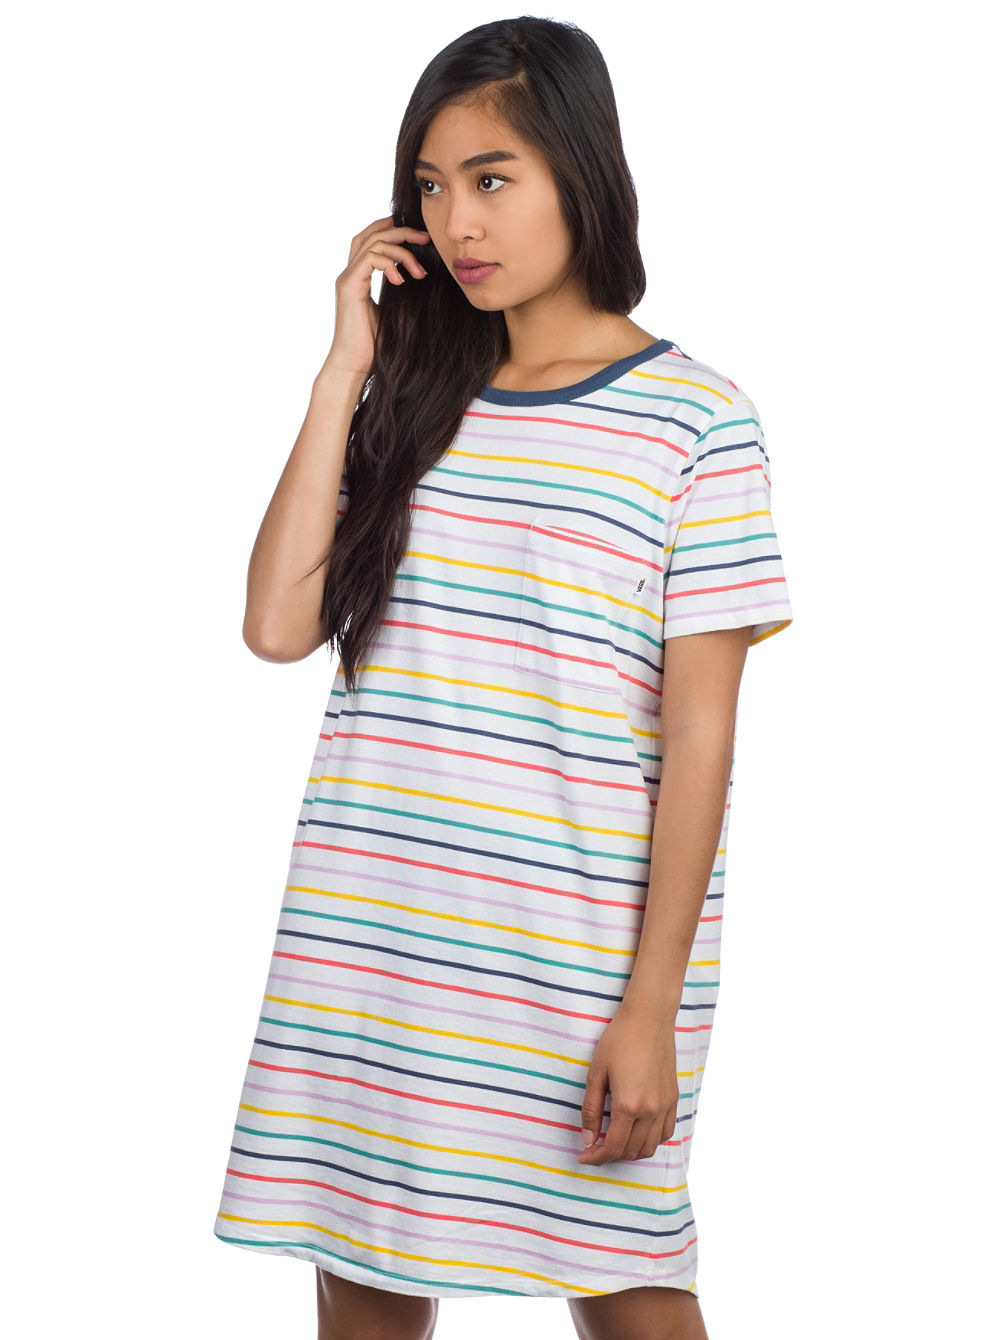 Vans Pool Party Kleid online kaufen bei blue-tomato.com